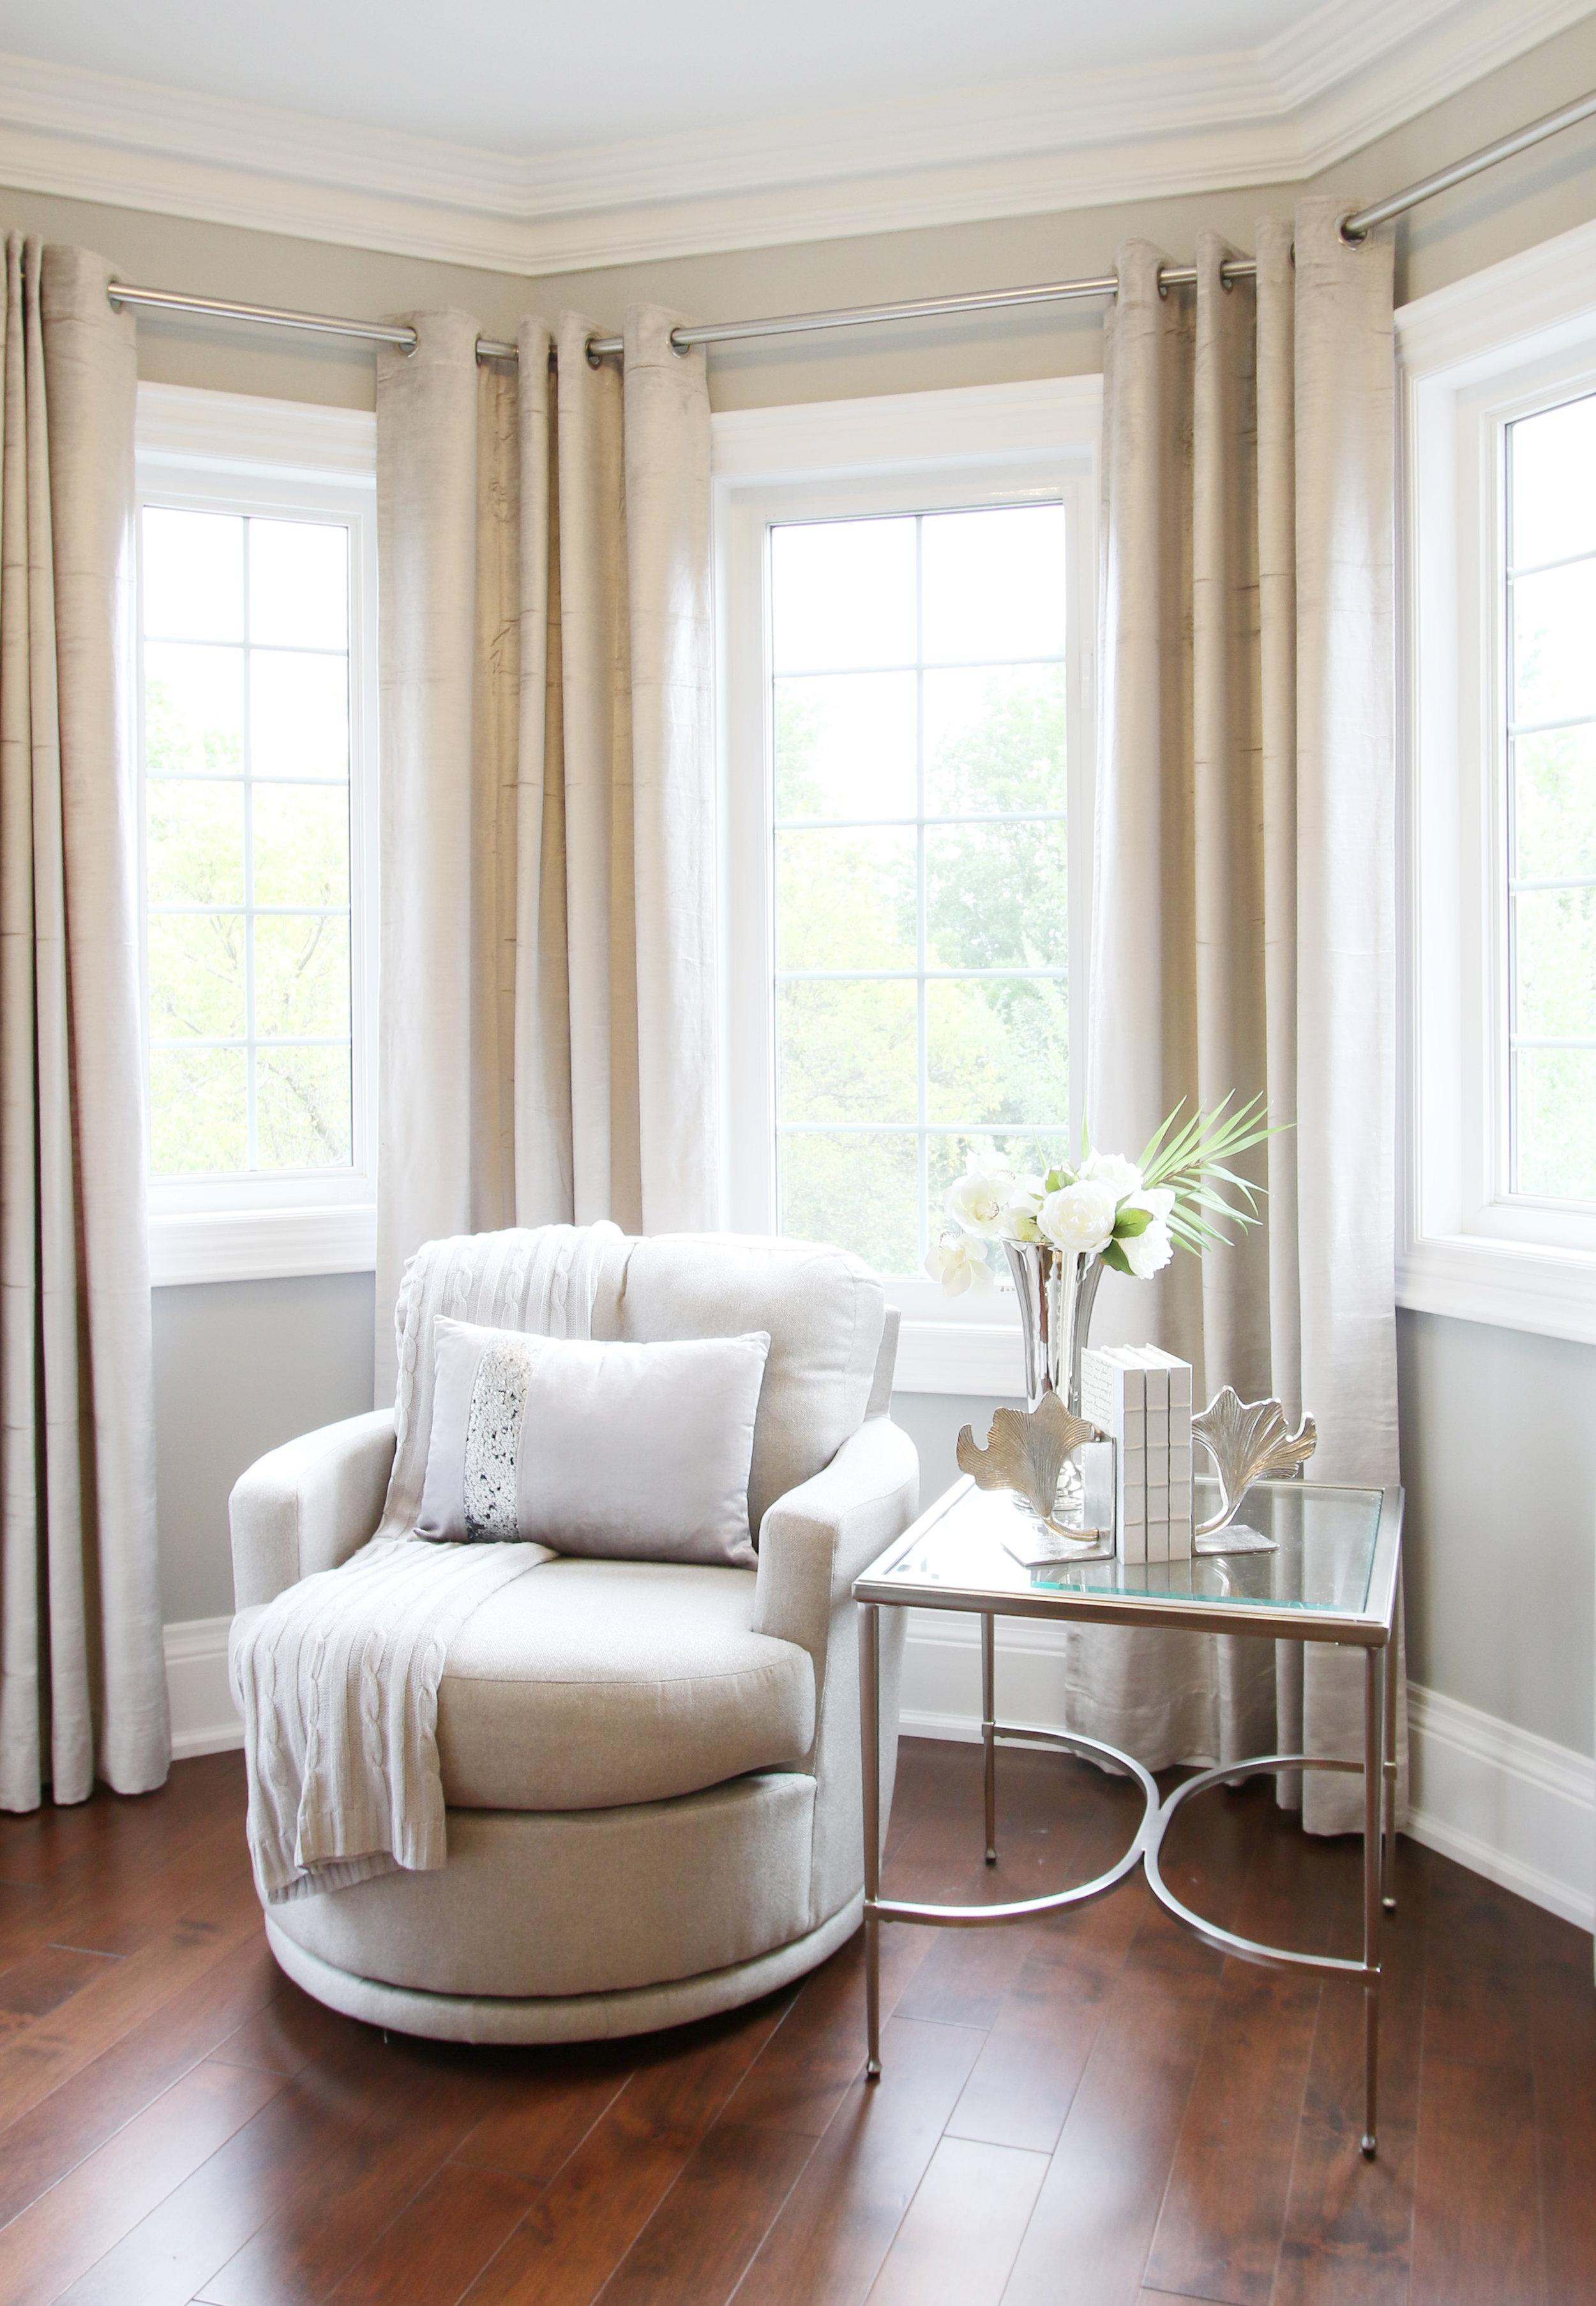 bedroom-kimmberly-capone-interior-design.jpg